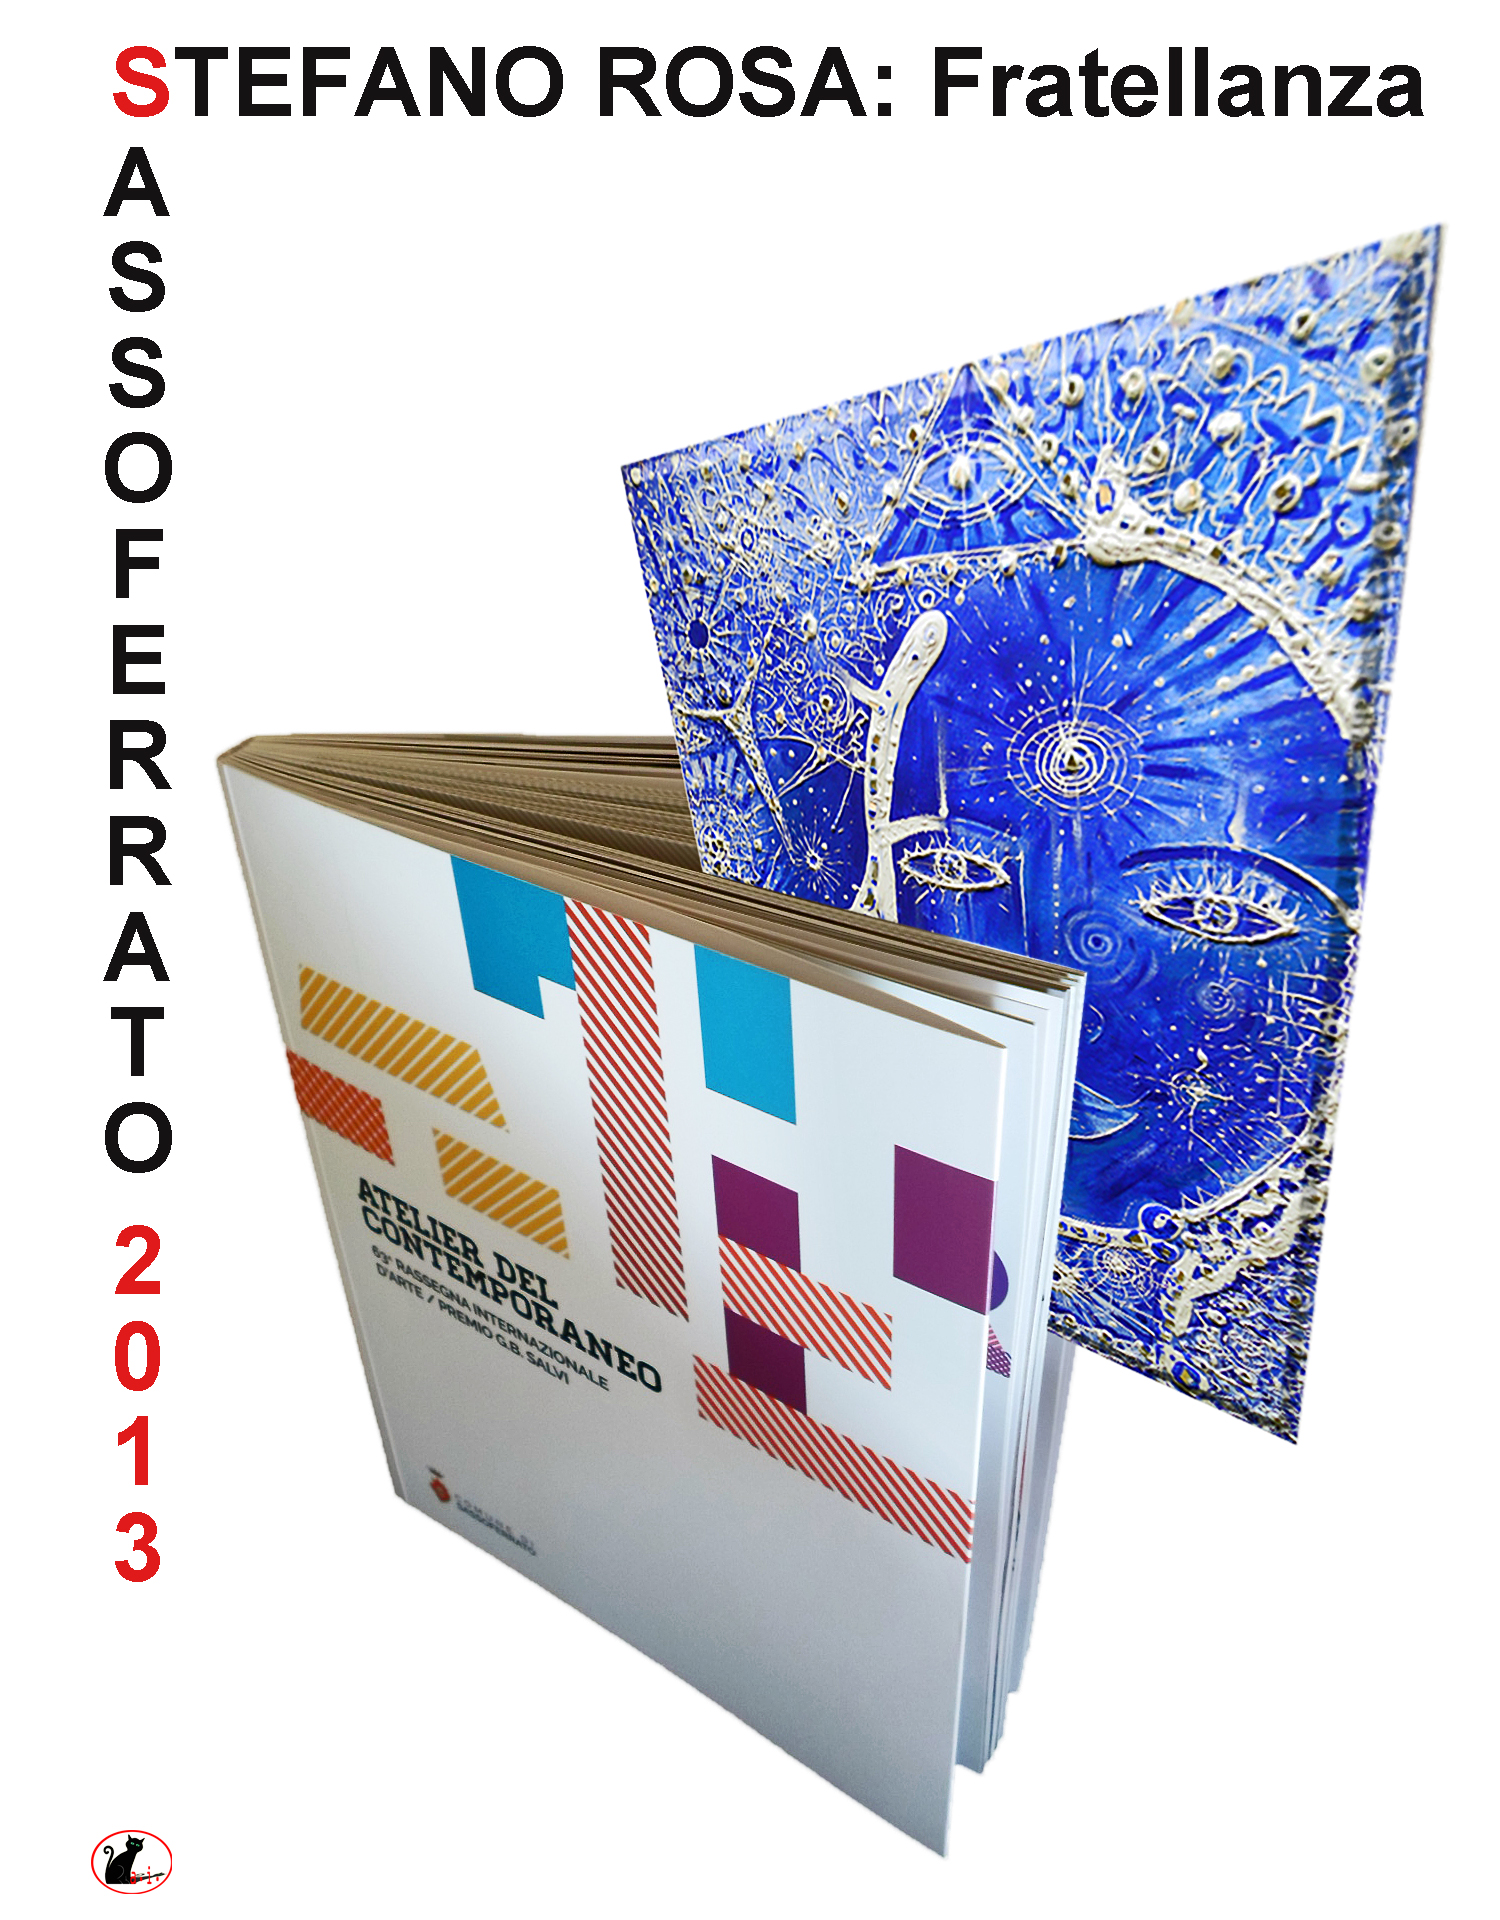 Sassoferrato 2013